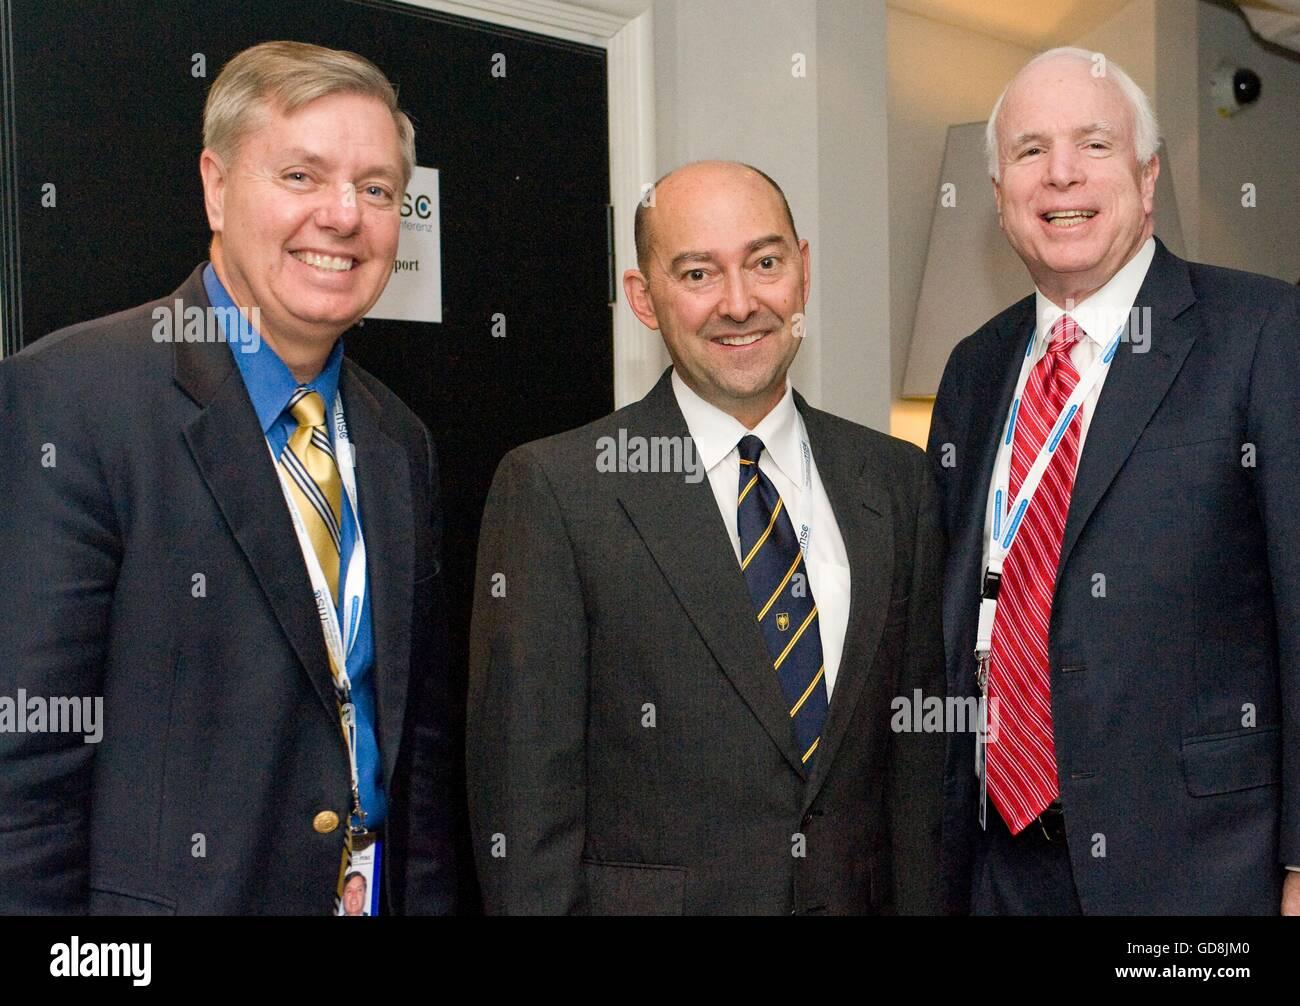 U.S Adm. James Stavridis, European Command and NATO Supreme Allied Commander, center, poses with senators Lindsay - Stock Image